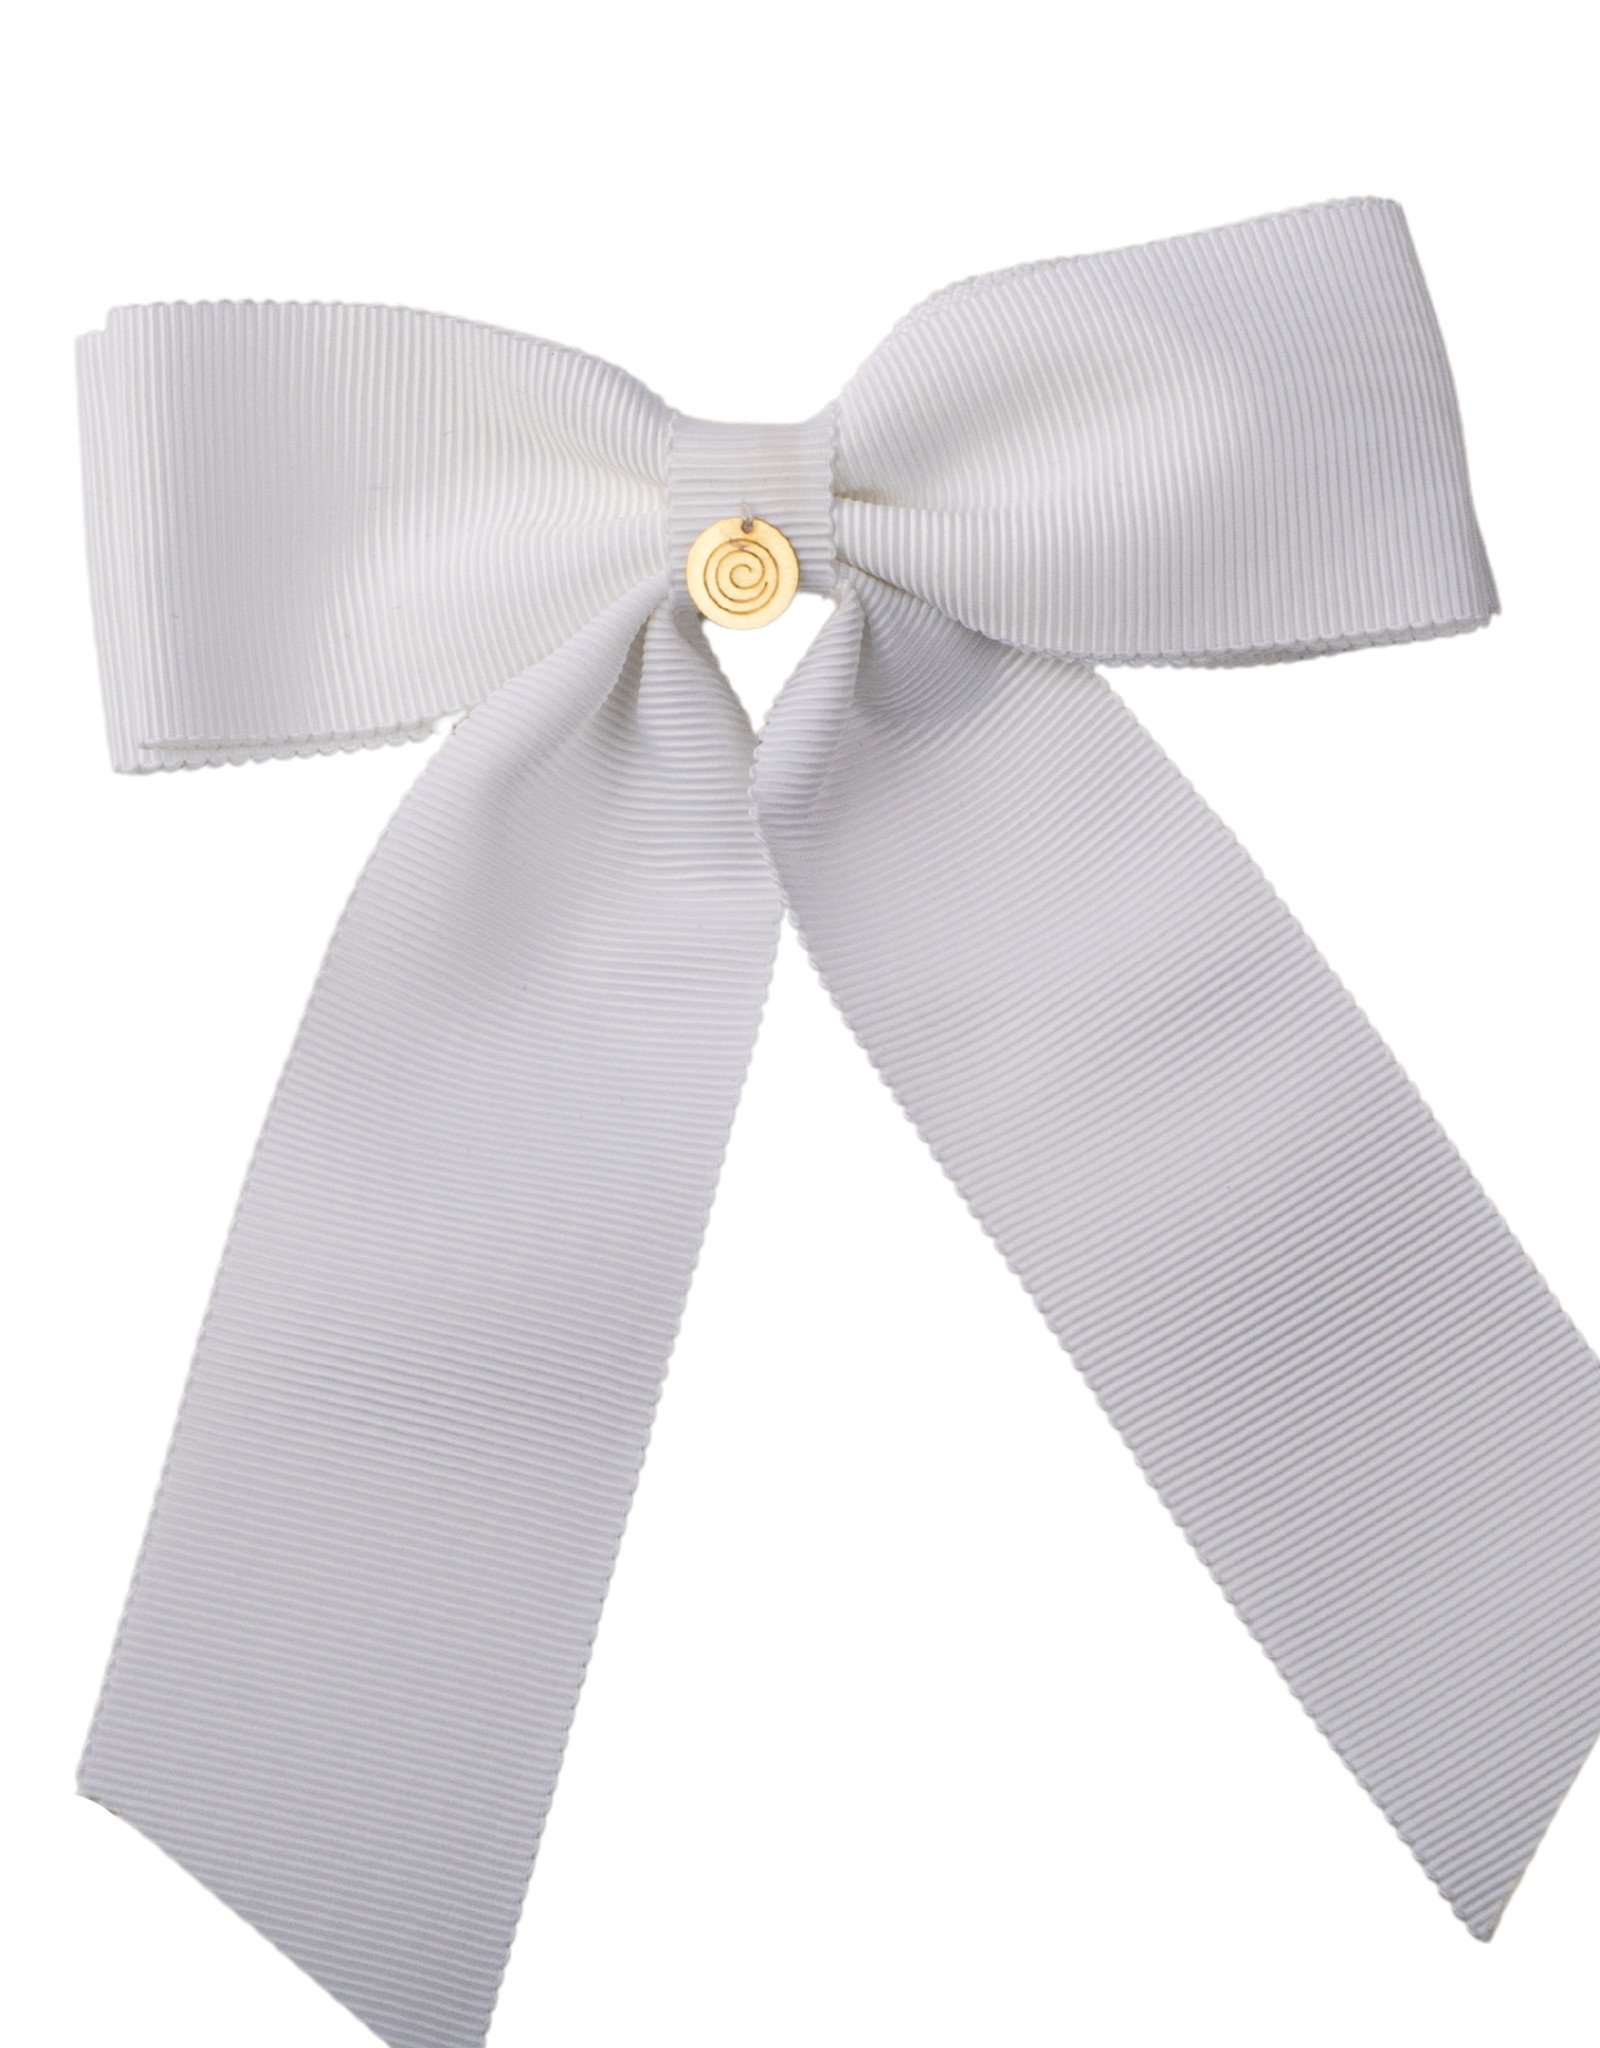 Cherie Cherie Grosgrain Double Bow Clip